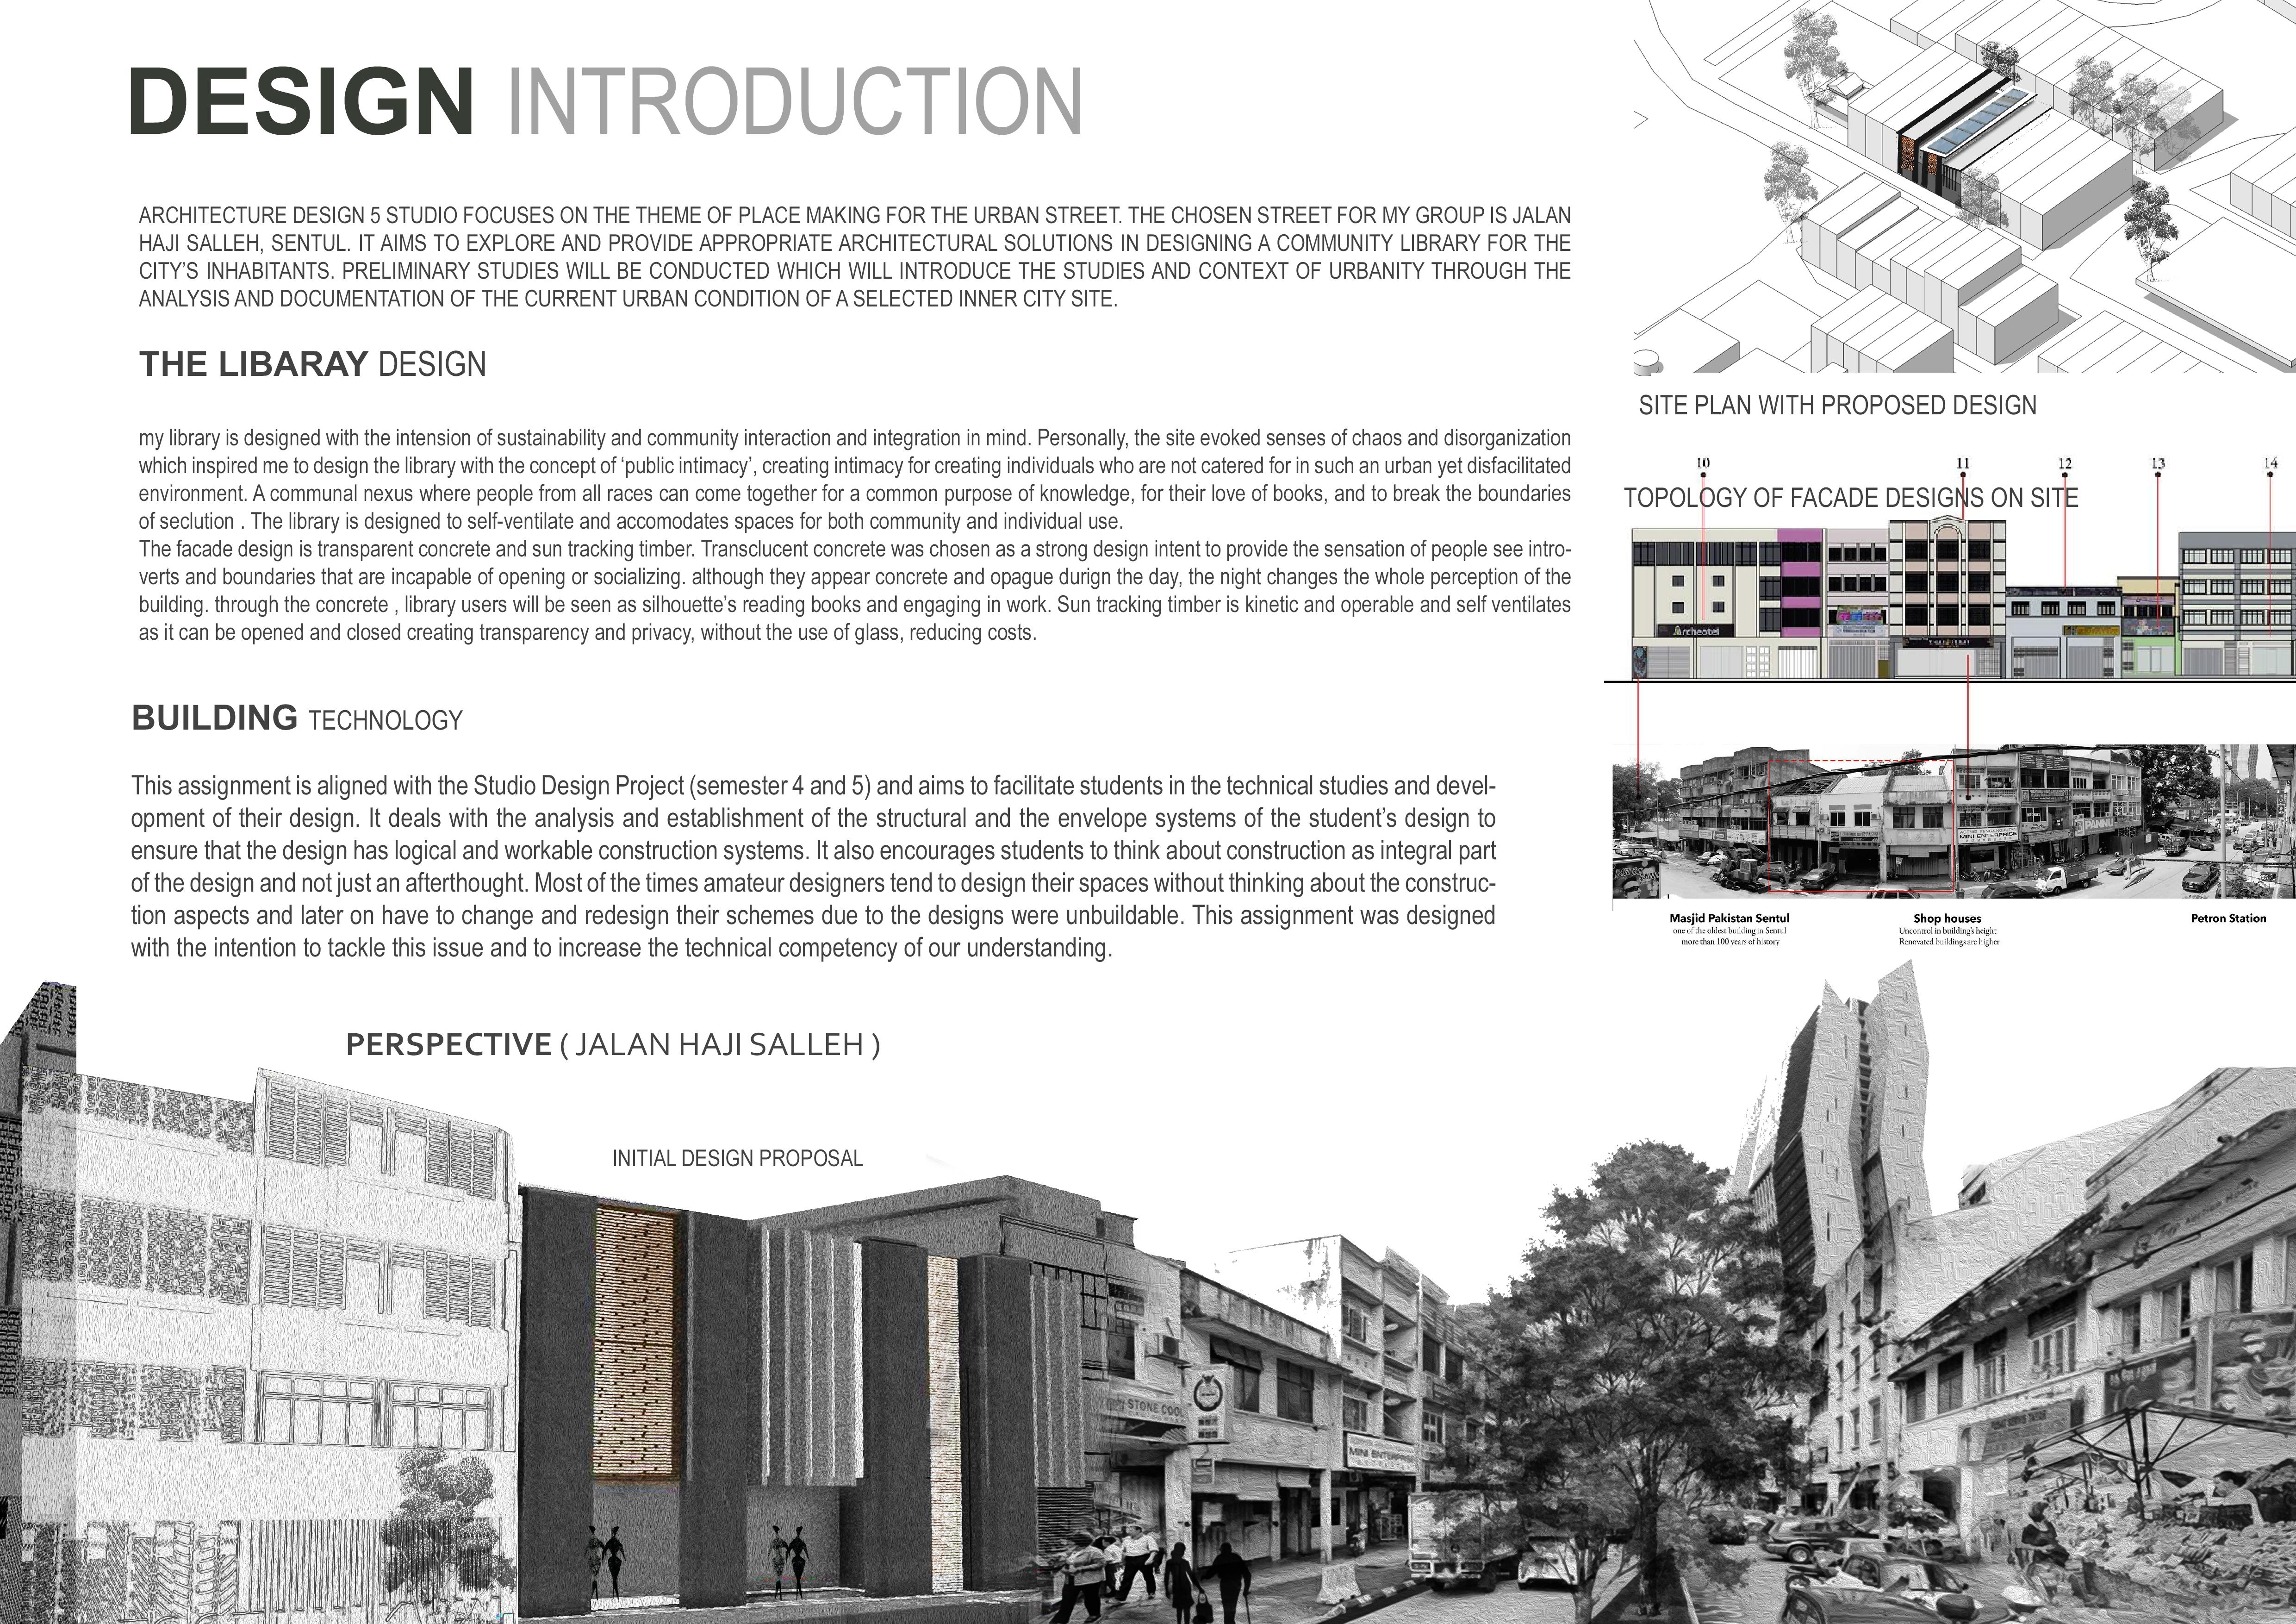 building technology 1 | archiportfolio